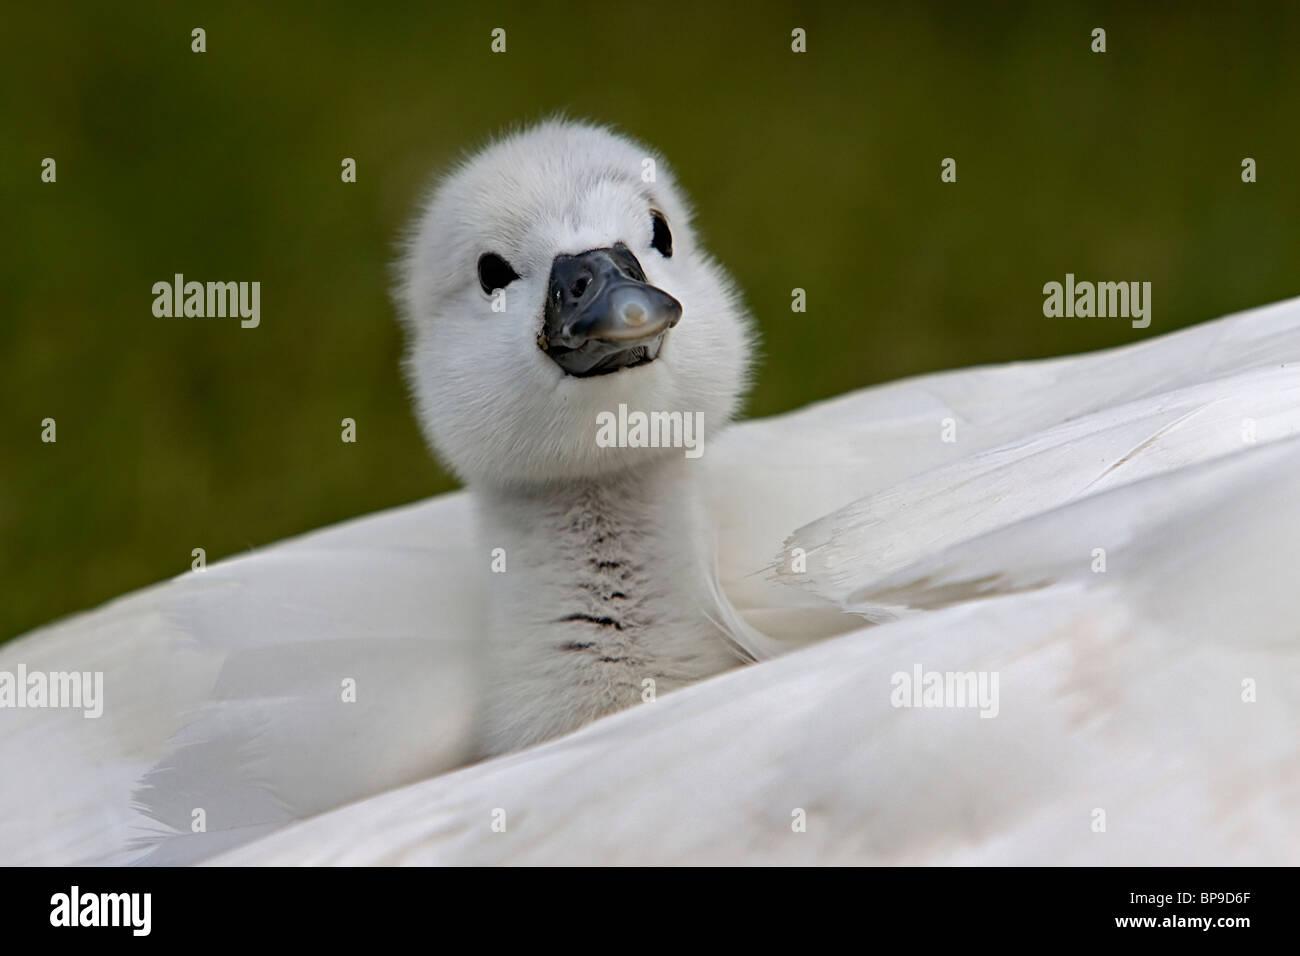 cygnet baby mute swan cute bird Cygnus olor - Stock Image